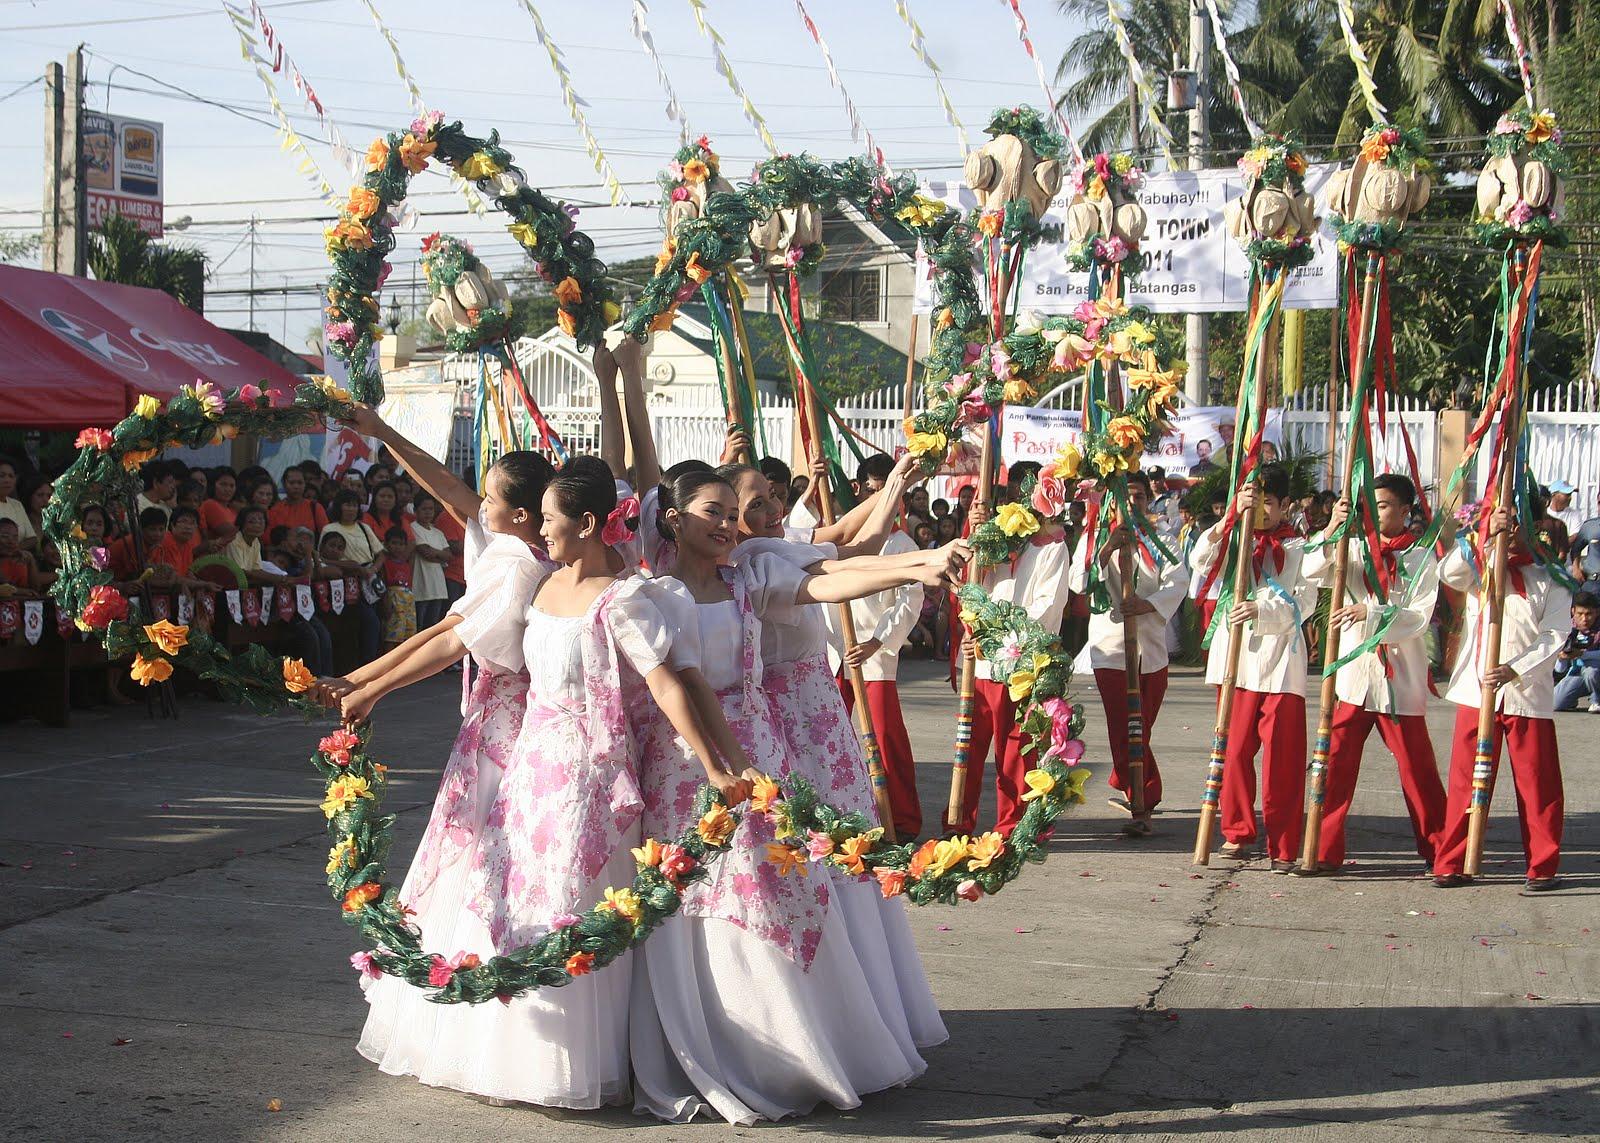 Pastulan Festival